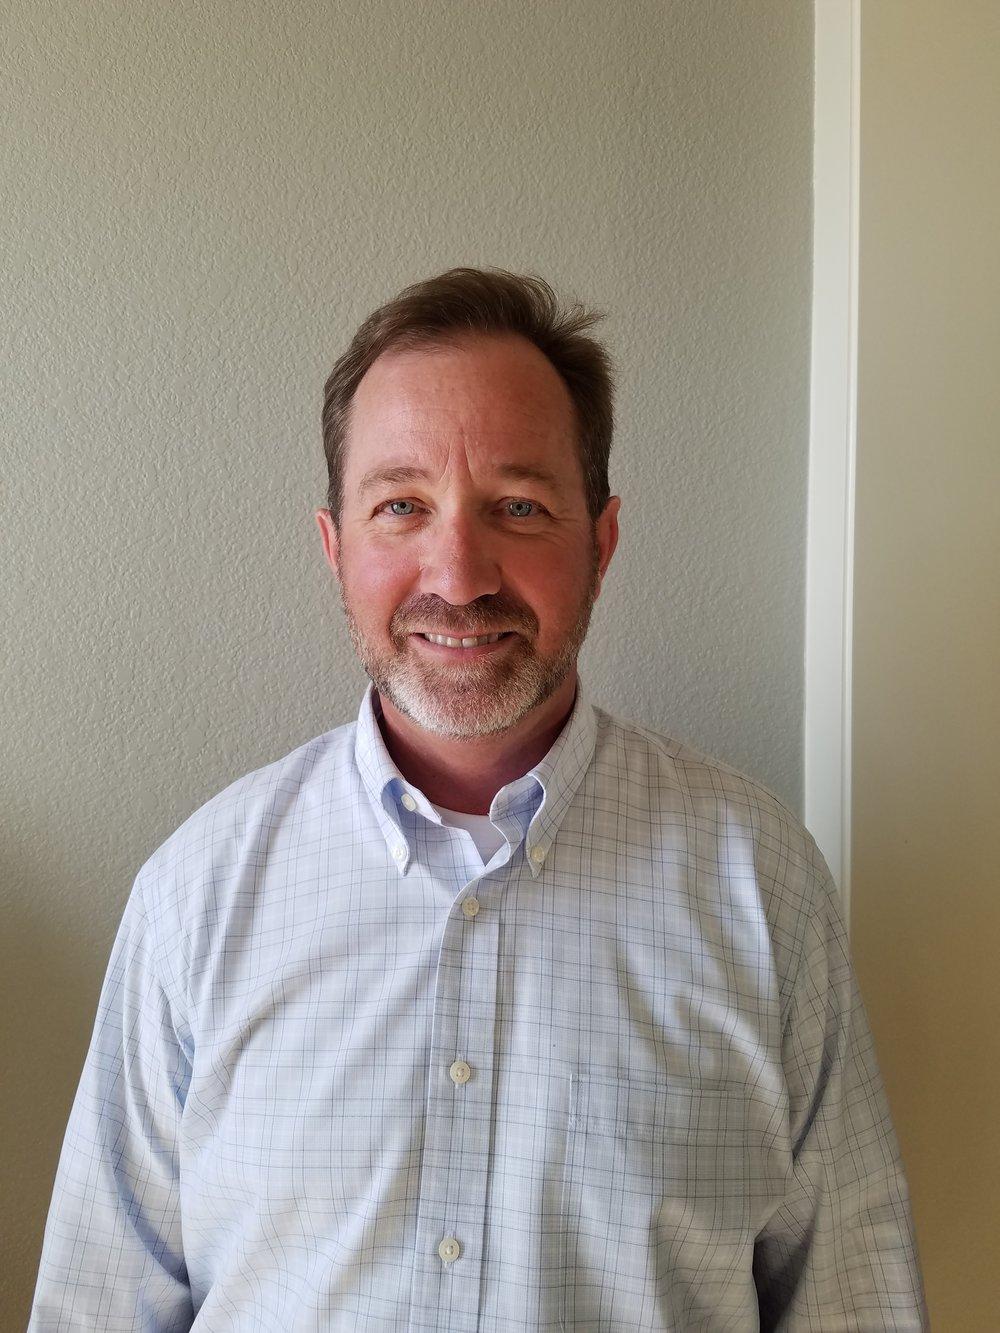 Chris Wilson Director of Facilities Tel: (208) 810-7818 cwilson@idahocom.org